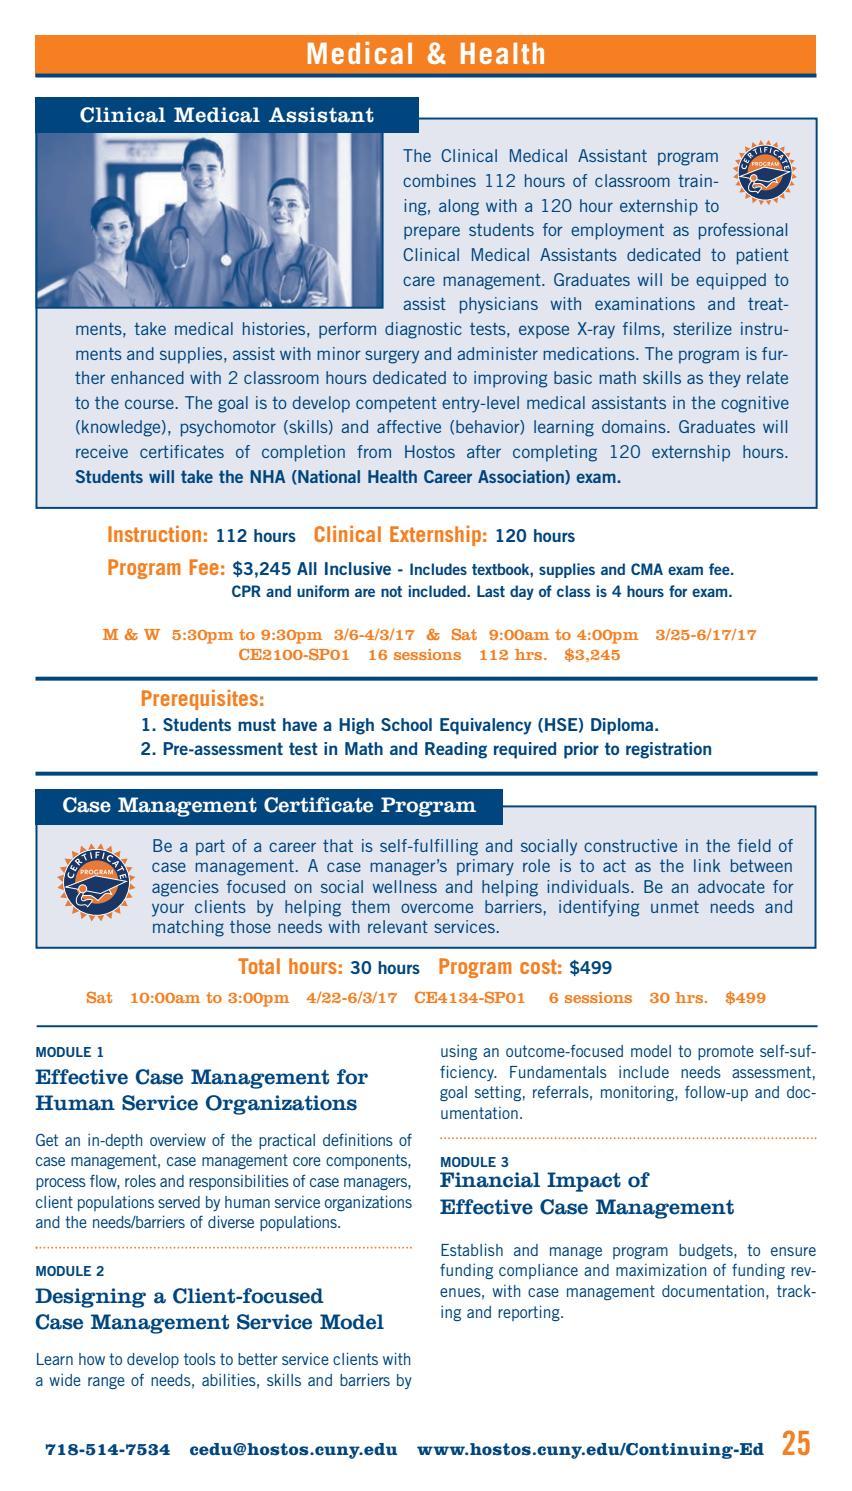 Spring 2017 Continuing Education Catalog by Hostos Community